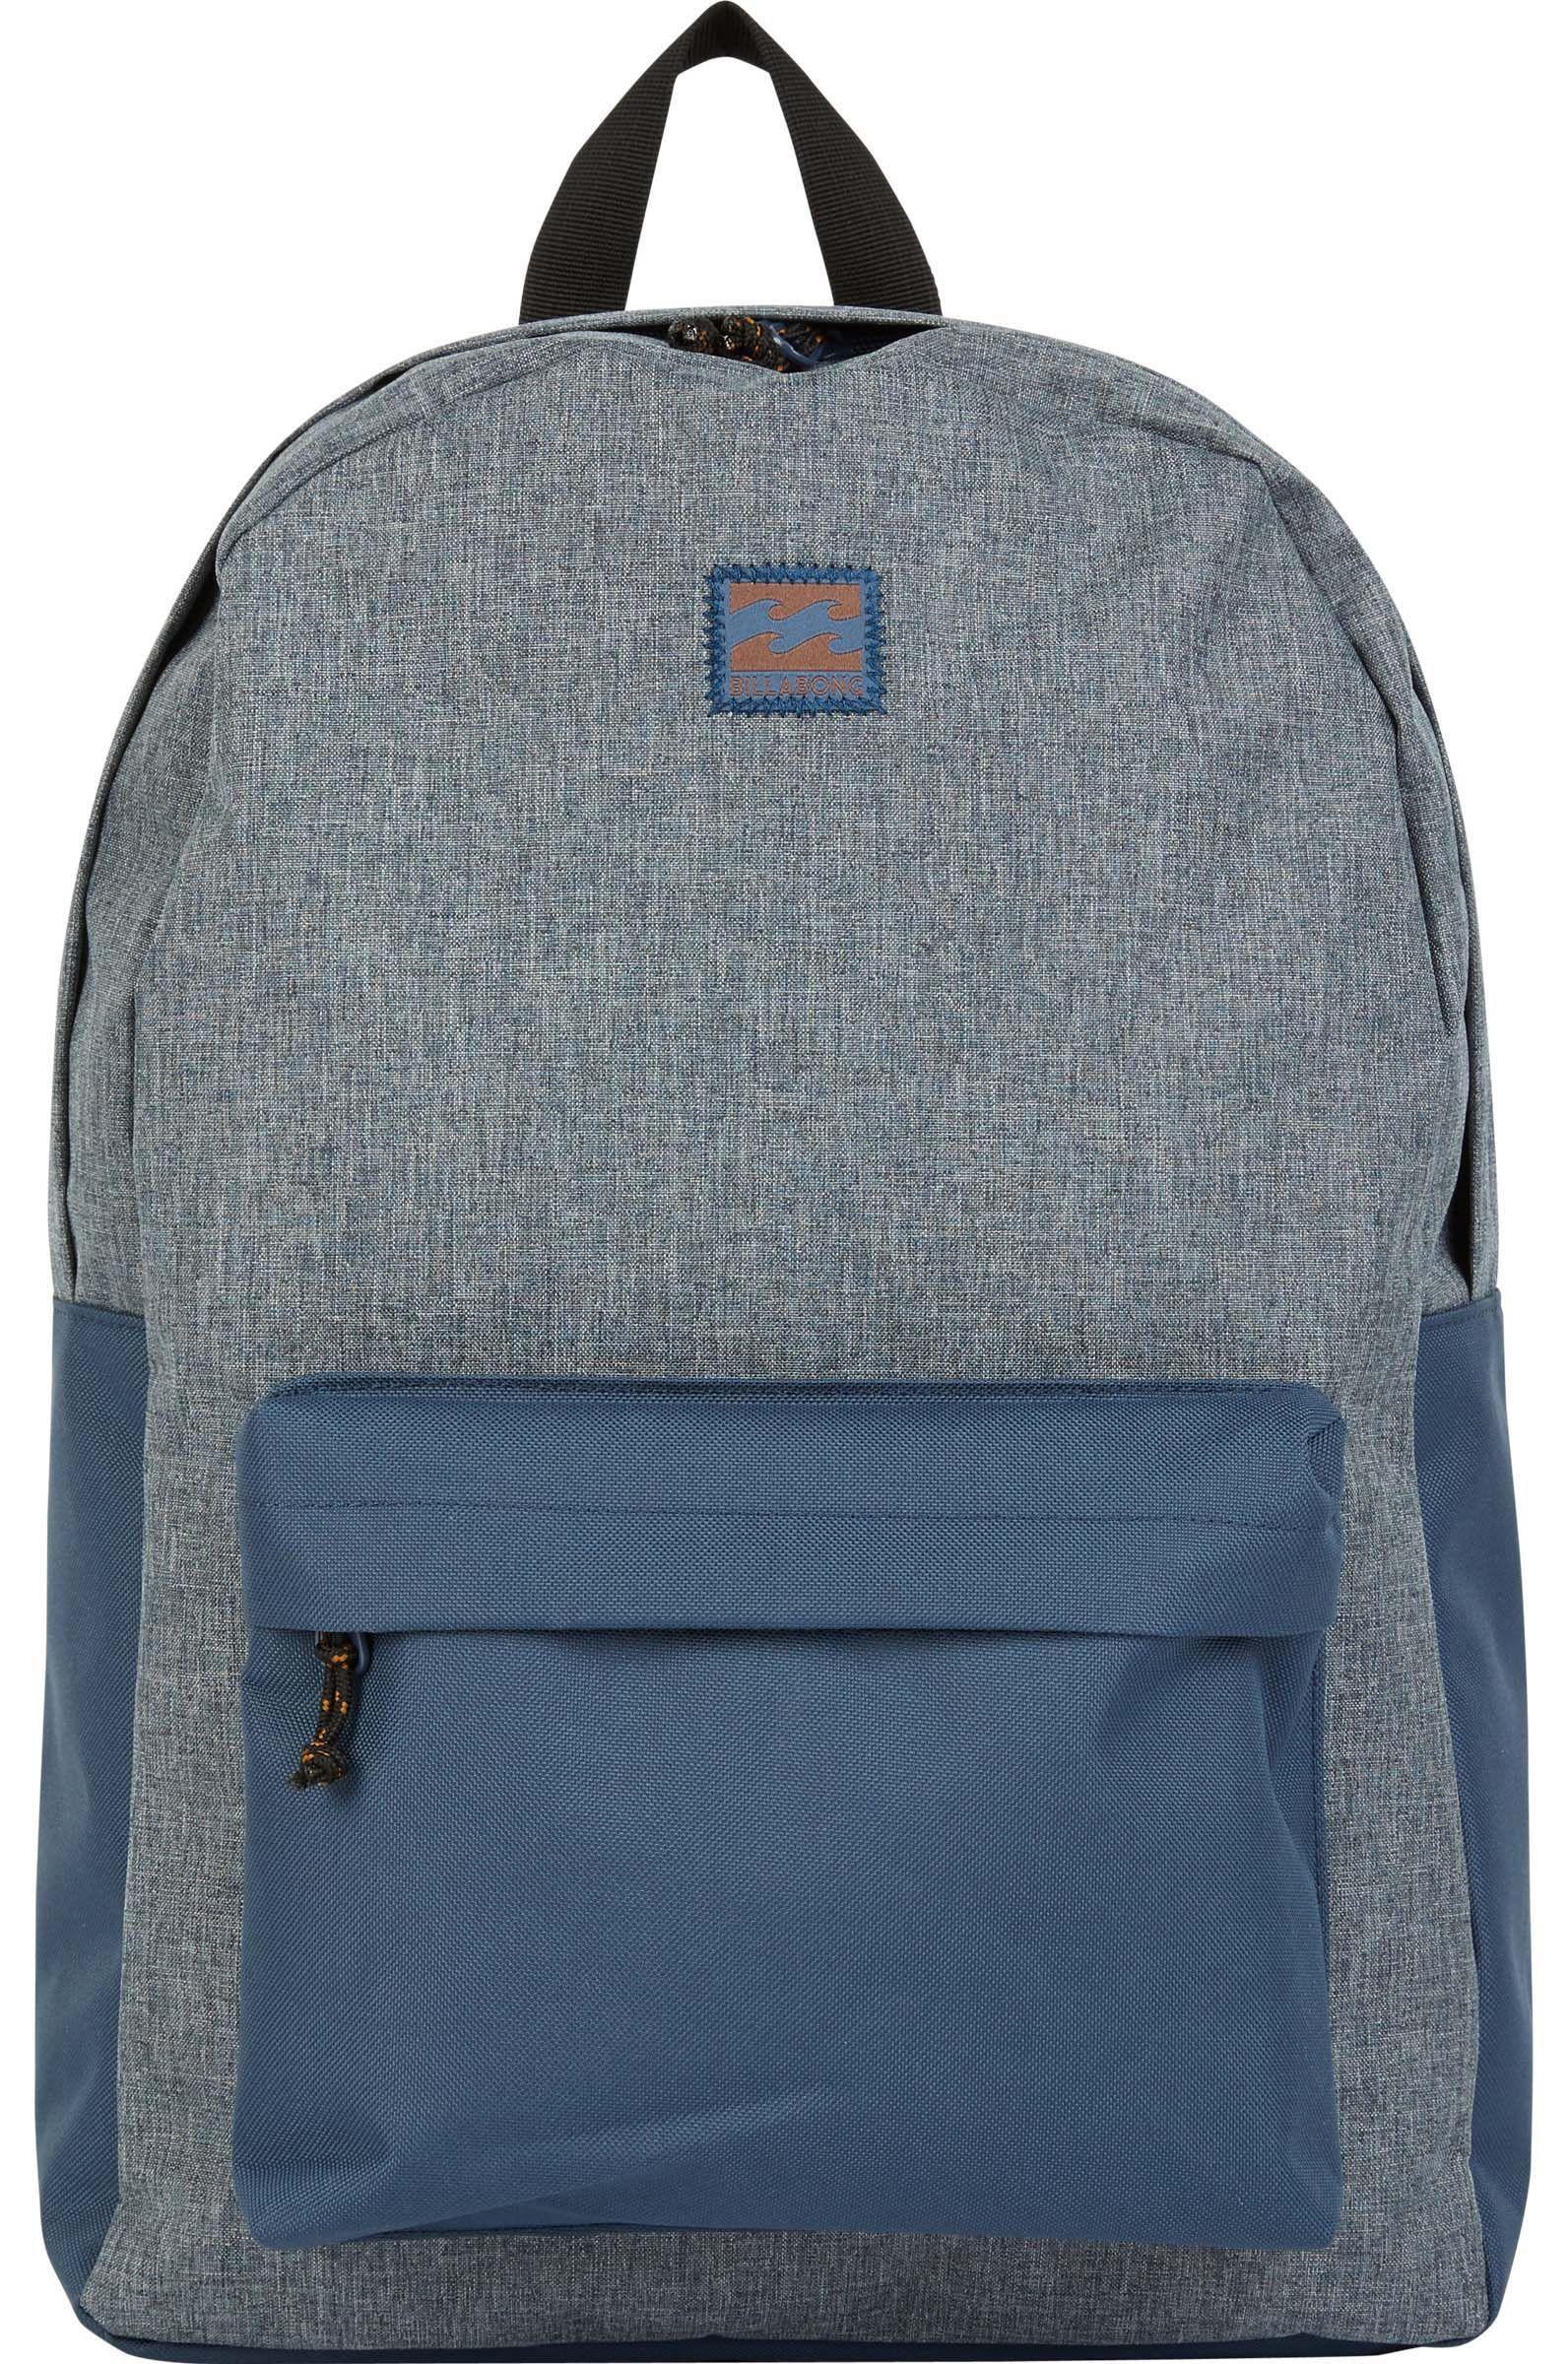 Billabong Backpack ALL DAY Dark Slate Htr